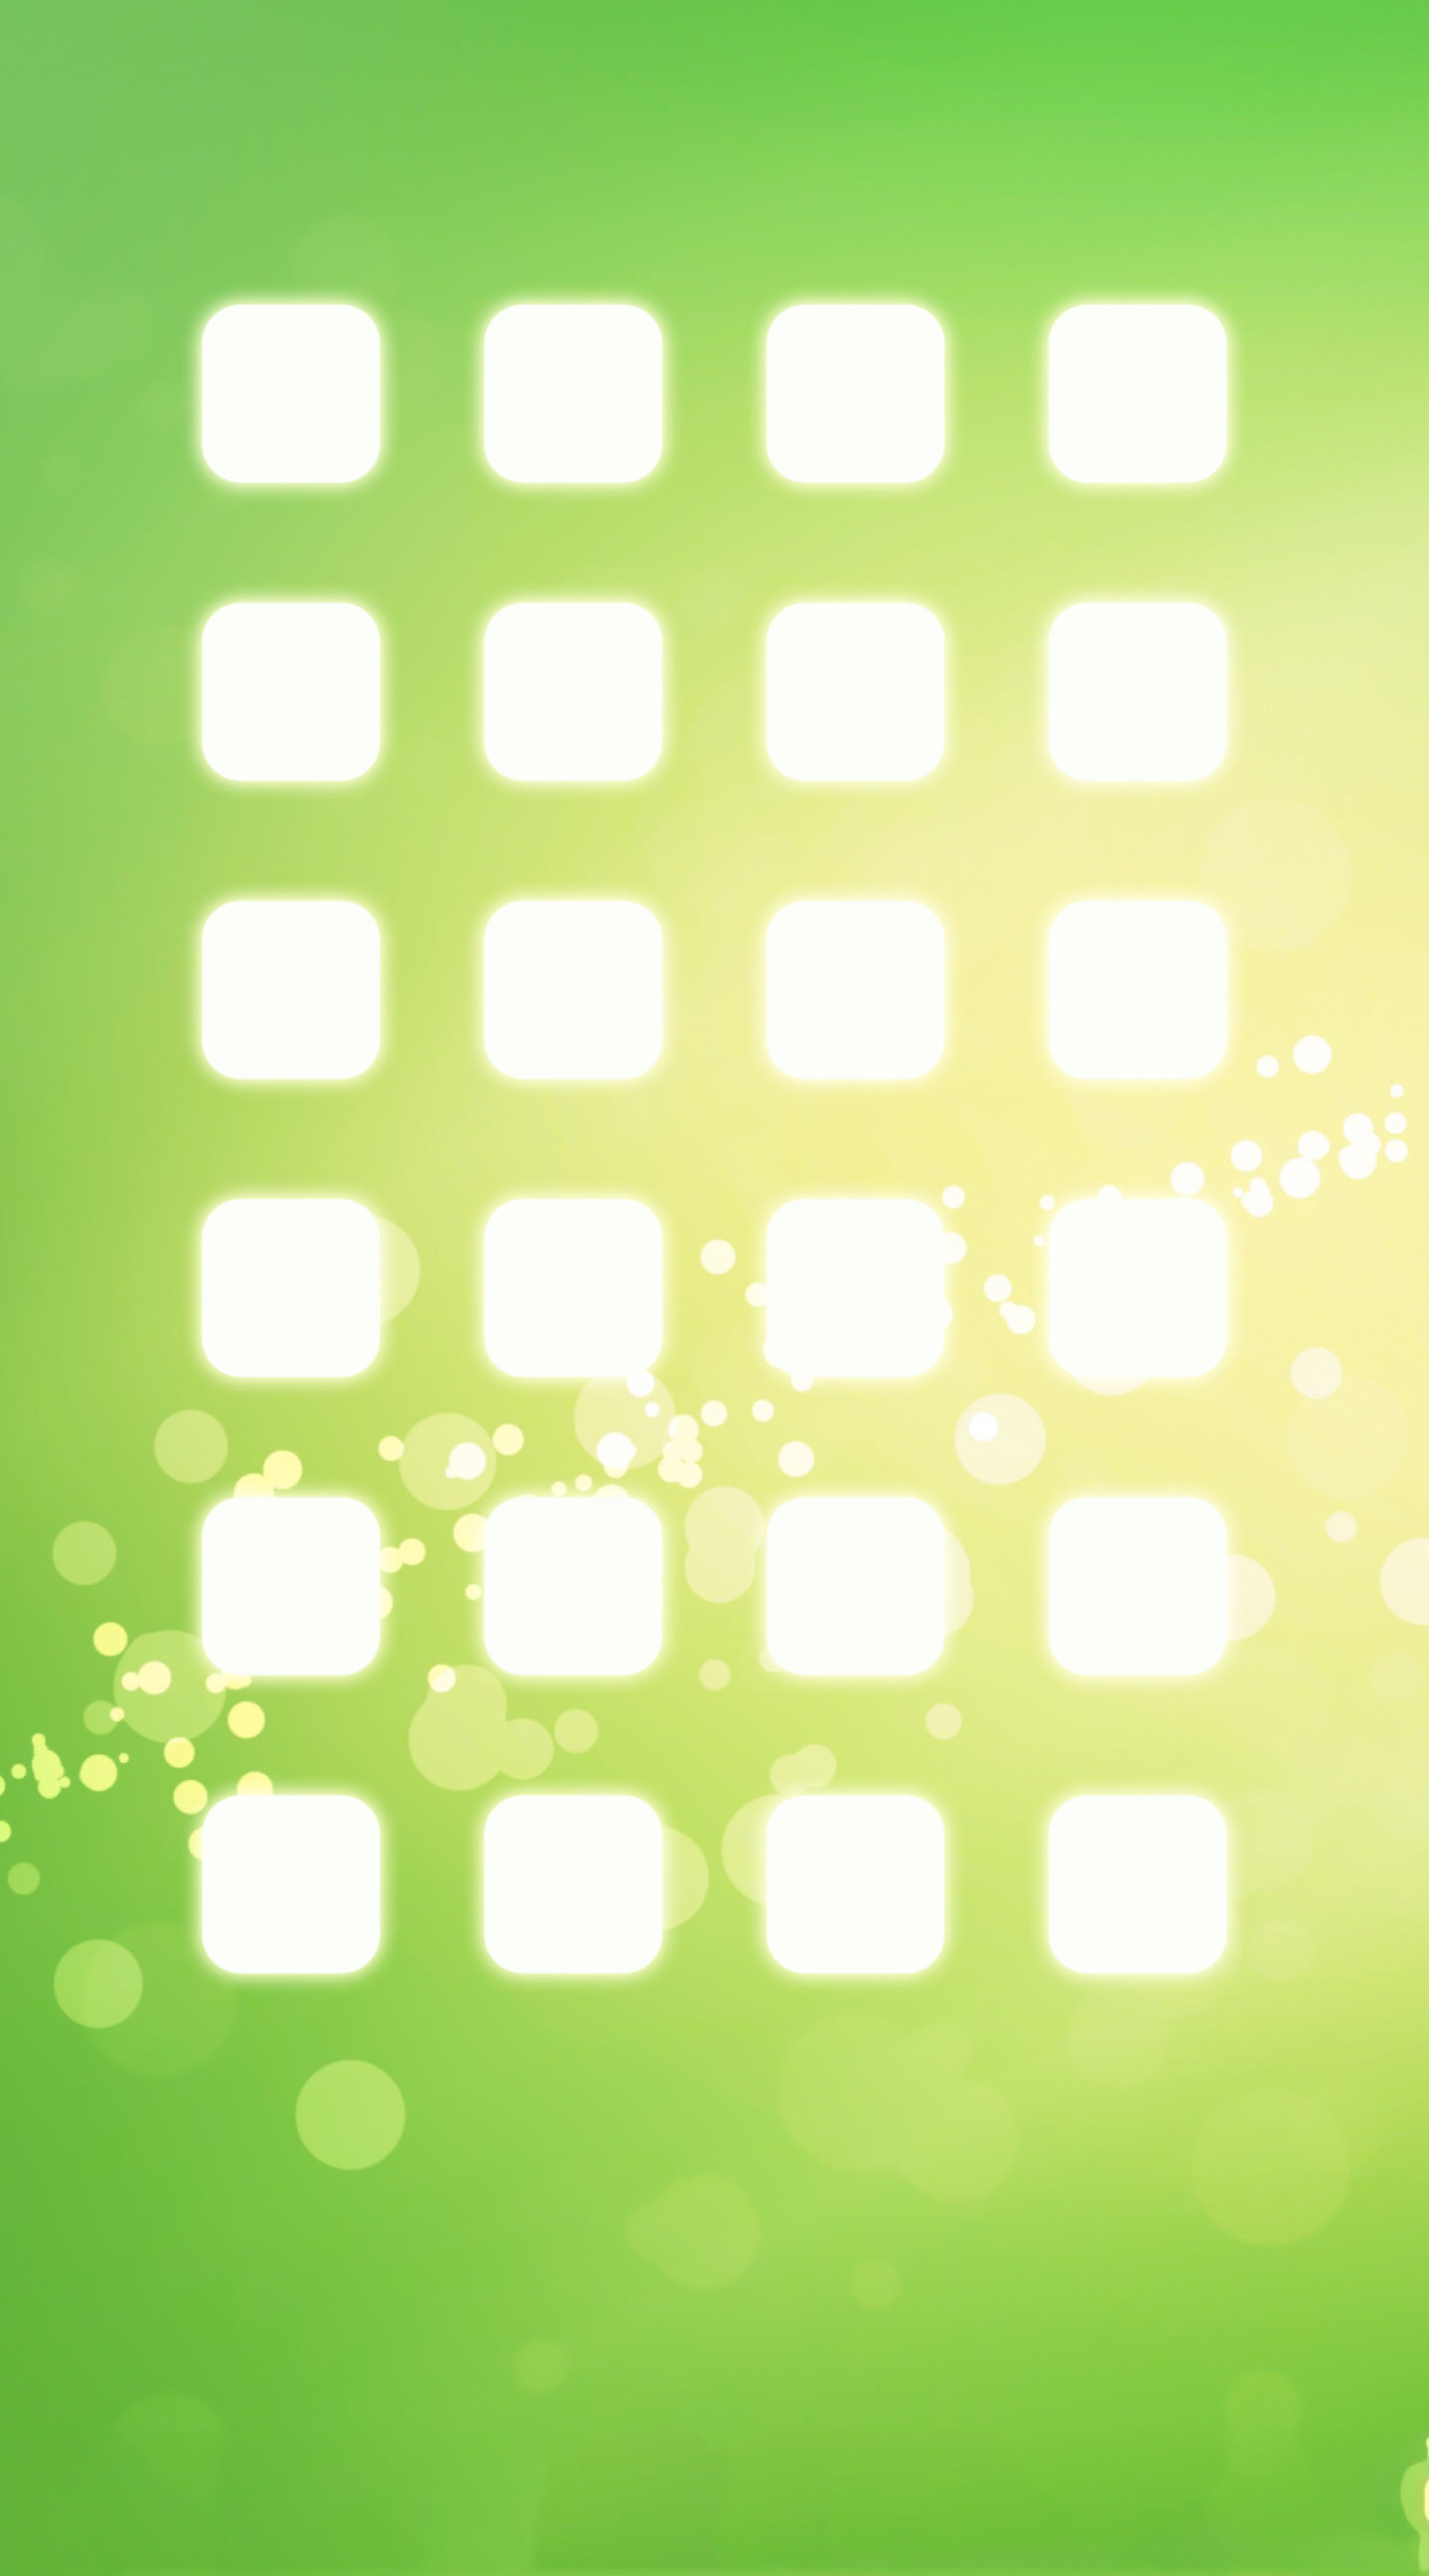 Shelf light green iPhone6s Plus / iPhone6 Plus Wallpaper